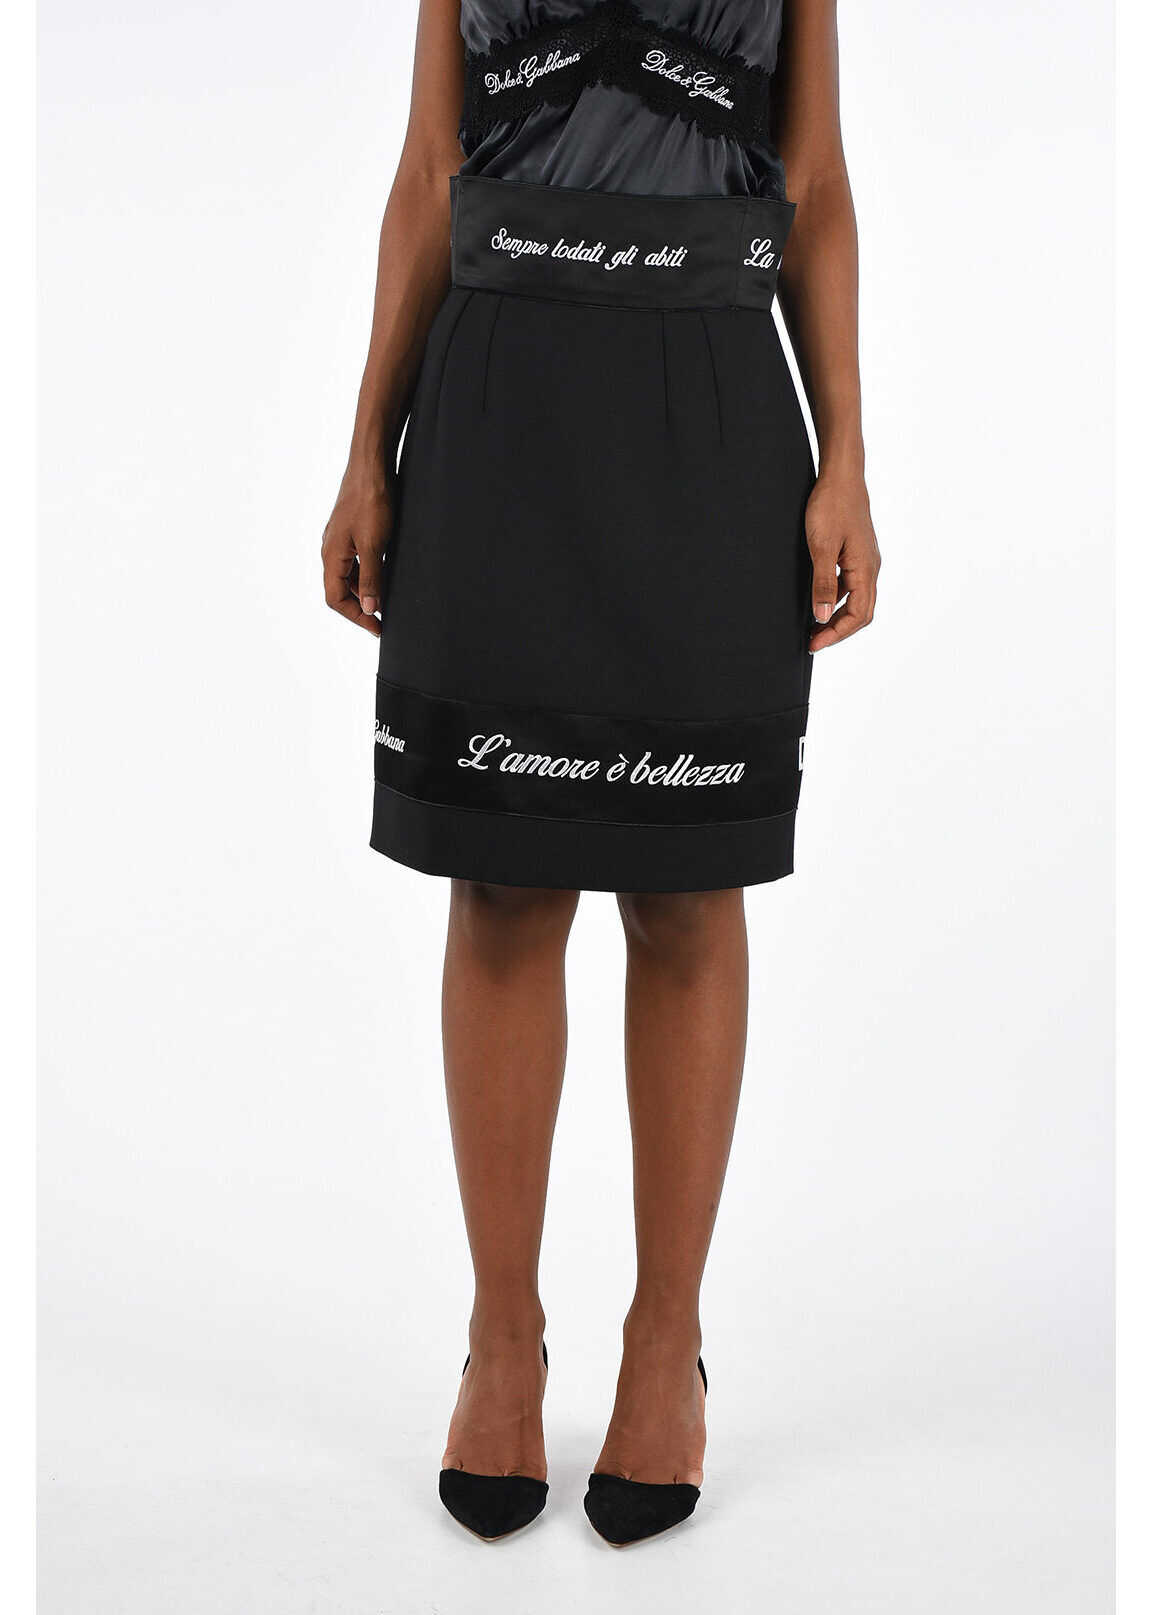 Dolce & Gabbana Virgin Wool Blend Skirt BLACK